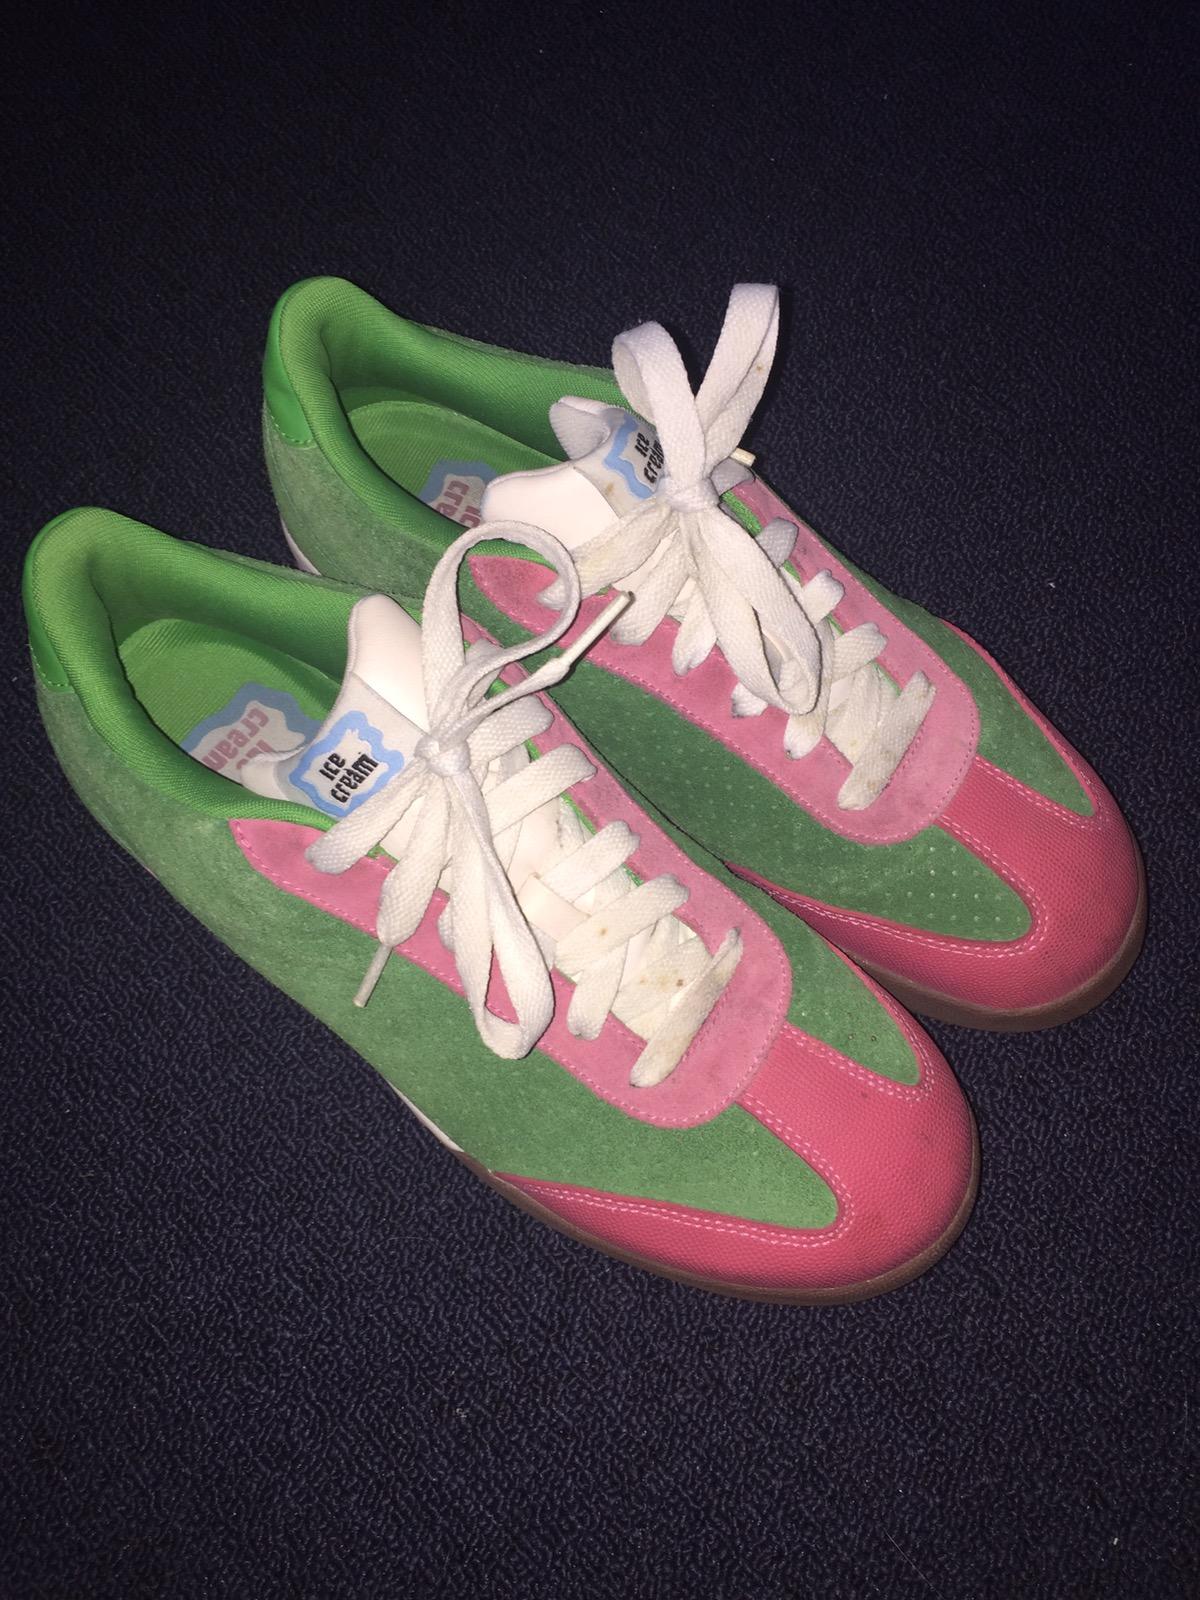 cefaeca8f87d0 Reebok Billionaire Boys Club Icecream Board Flip 1. Reebok Icecream Board  Flip 1 Watermelon Flavor Pink Green